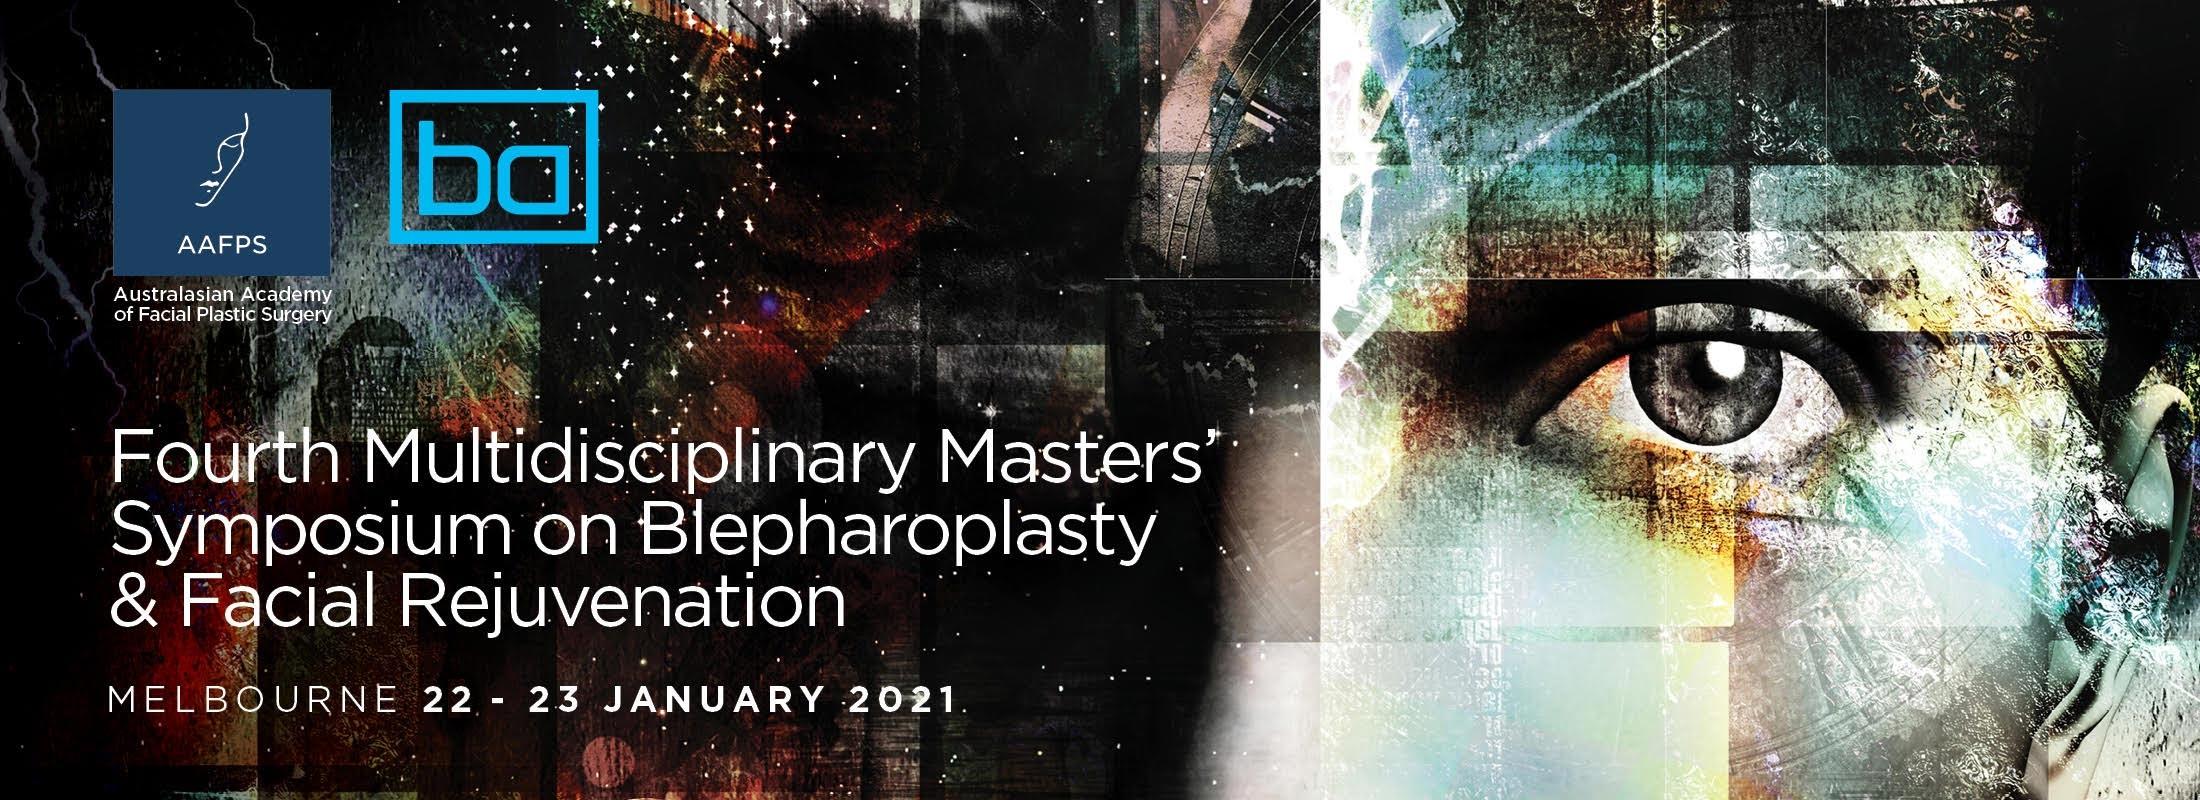 Virtual Bleph Symposium Revised Program  22 - 23 January